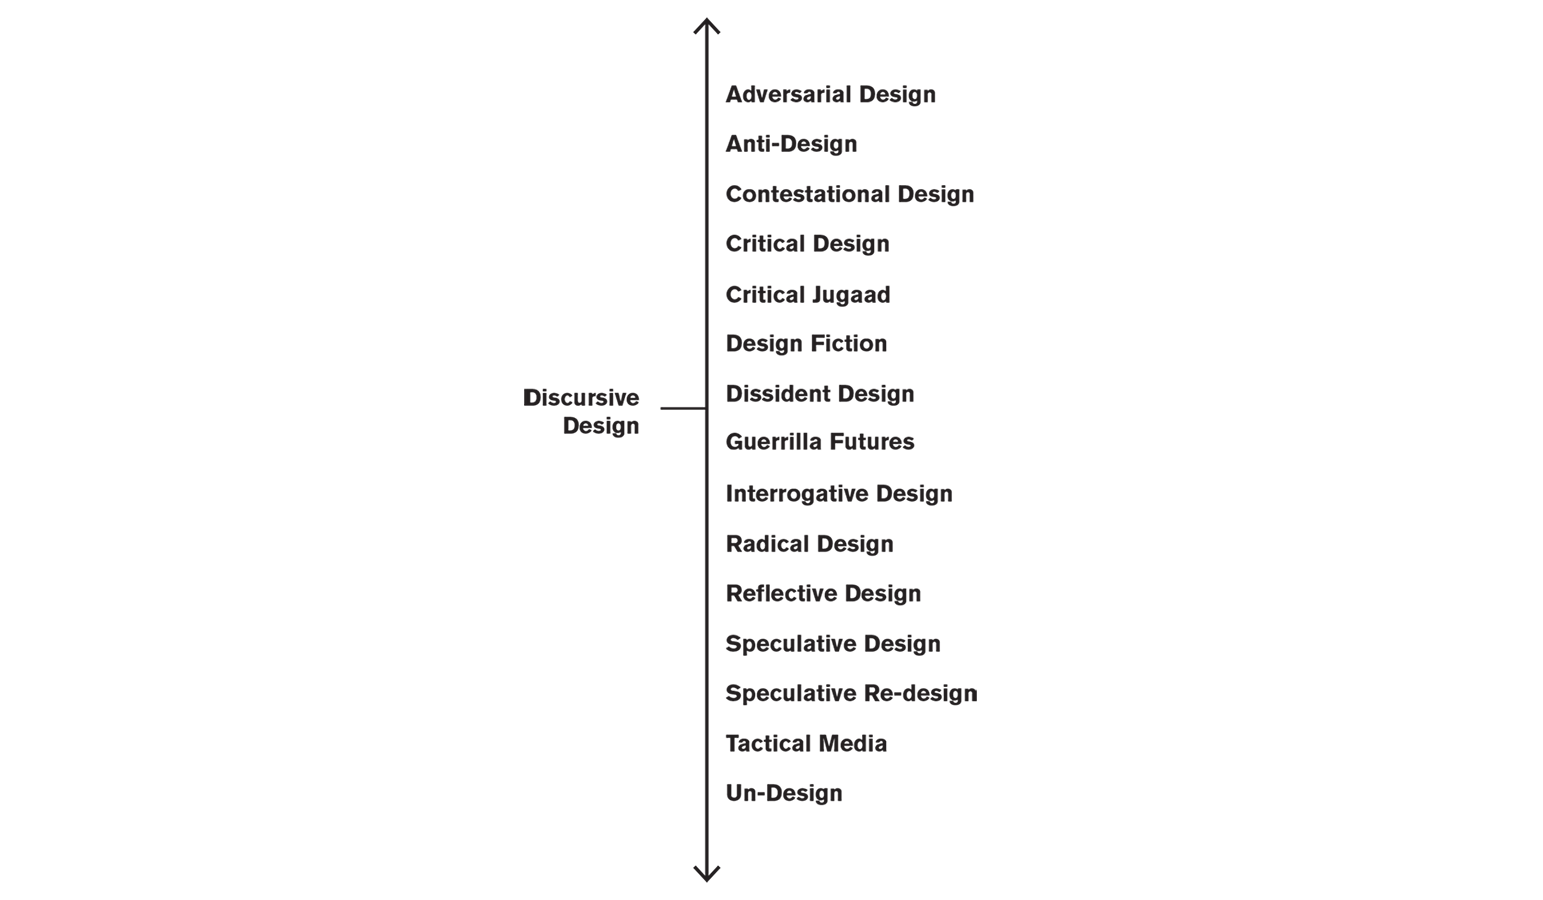 Discursive Design as a Genus